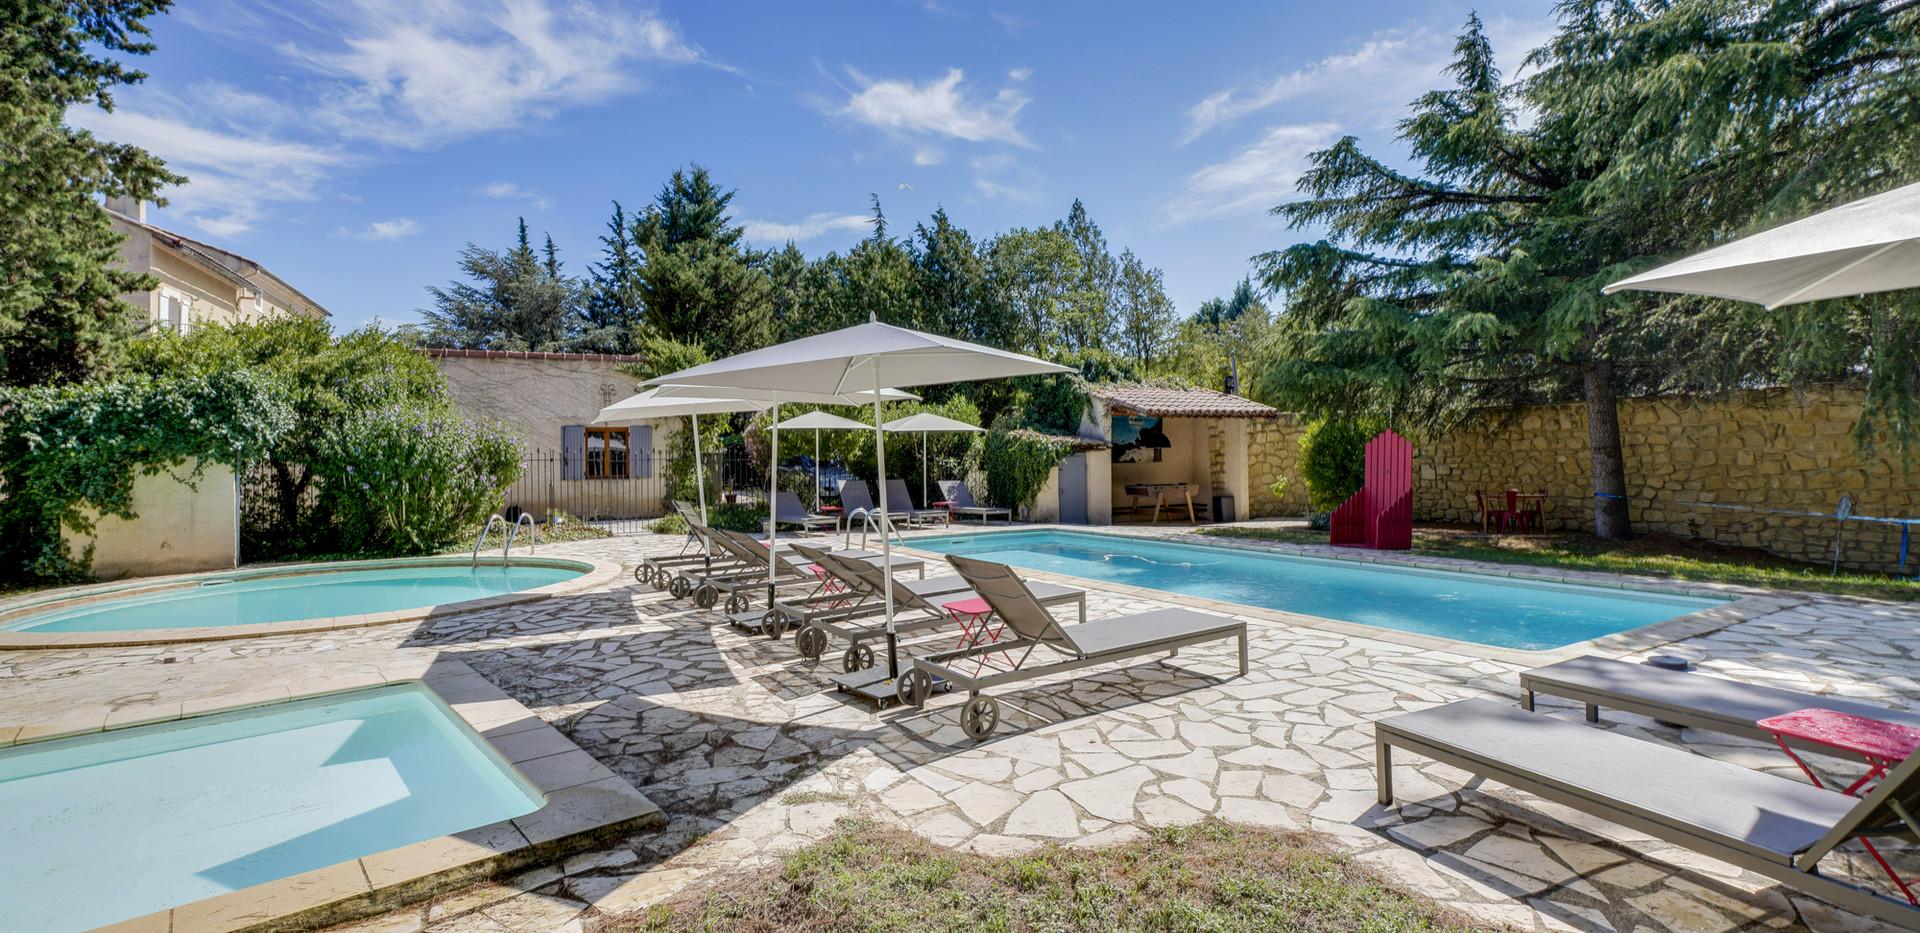 Mas Saint-Gens swimming pools, Provence area